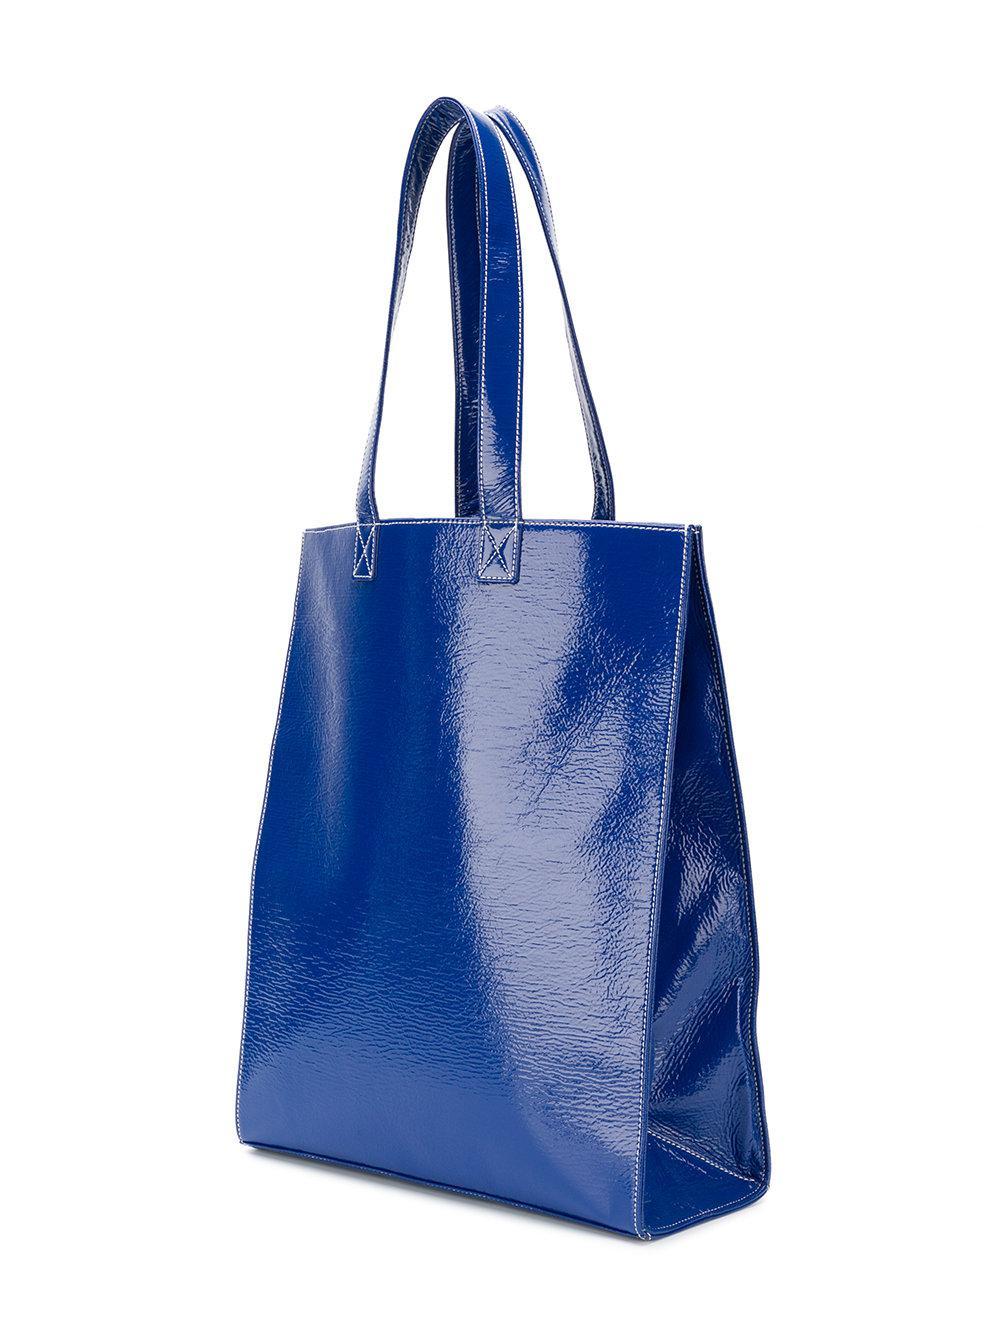 Courreges Medium Logo Front Tote Bag in Blue